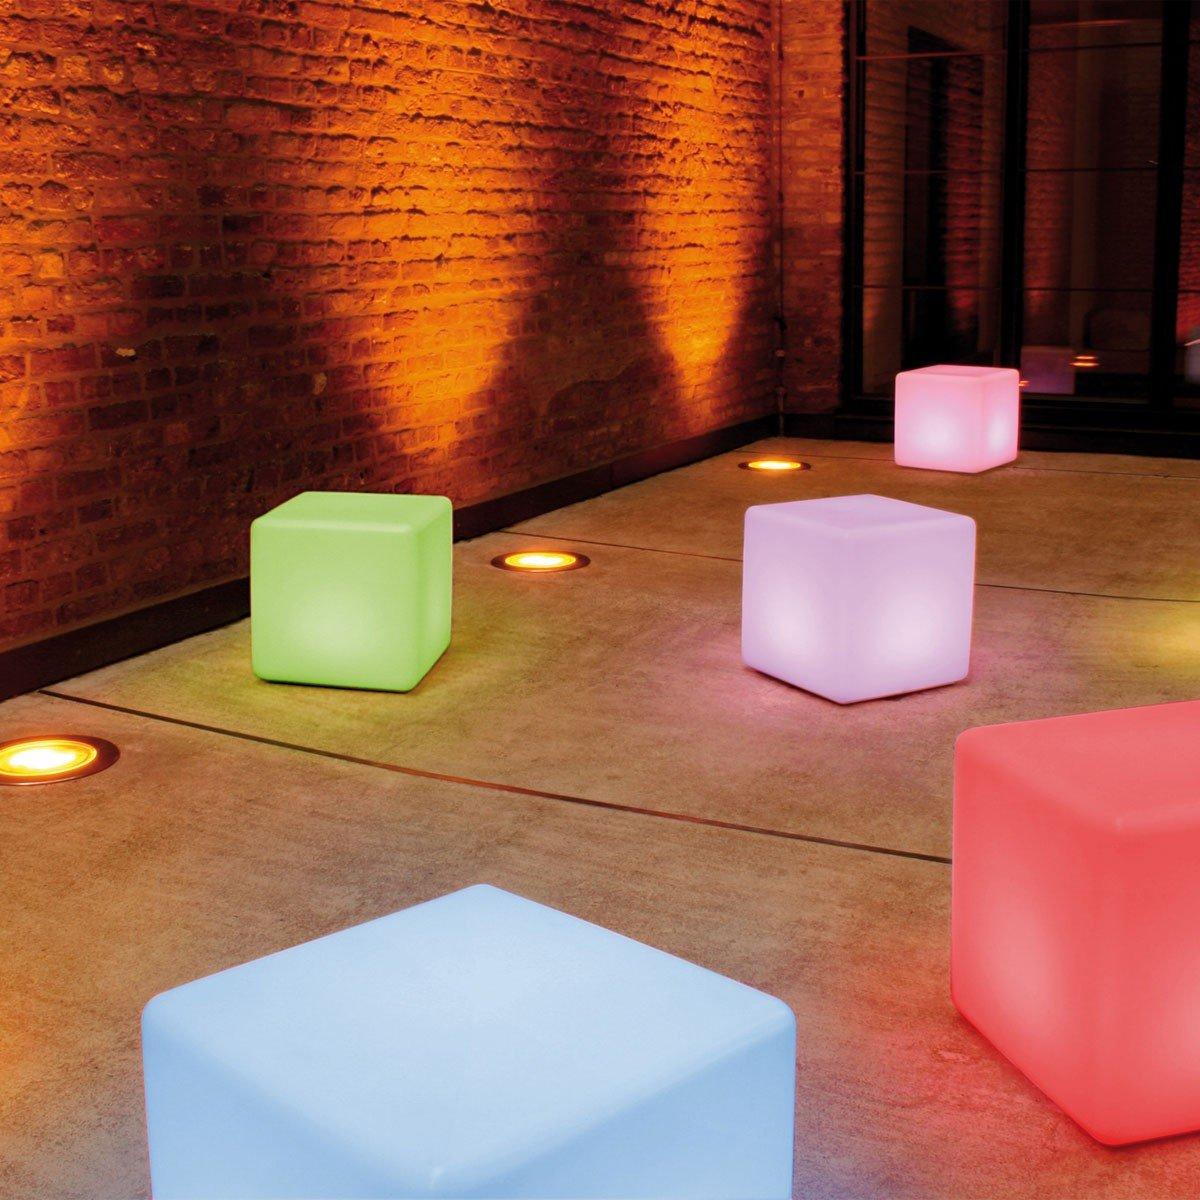 moree LED Bodenleuchte Cube LED Pro Accu, Weiß, Kunststoff, 06-01-01